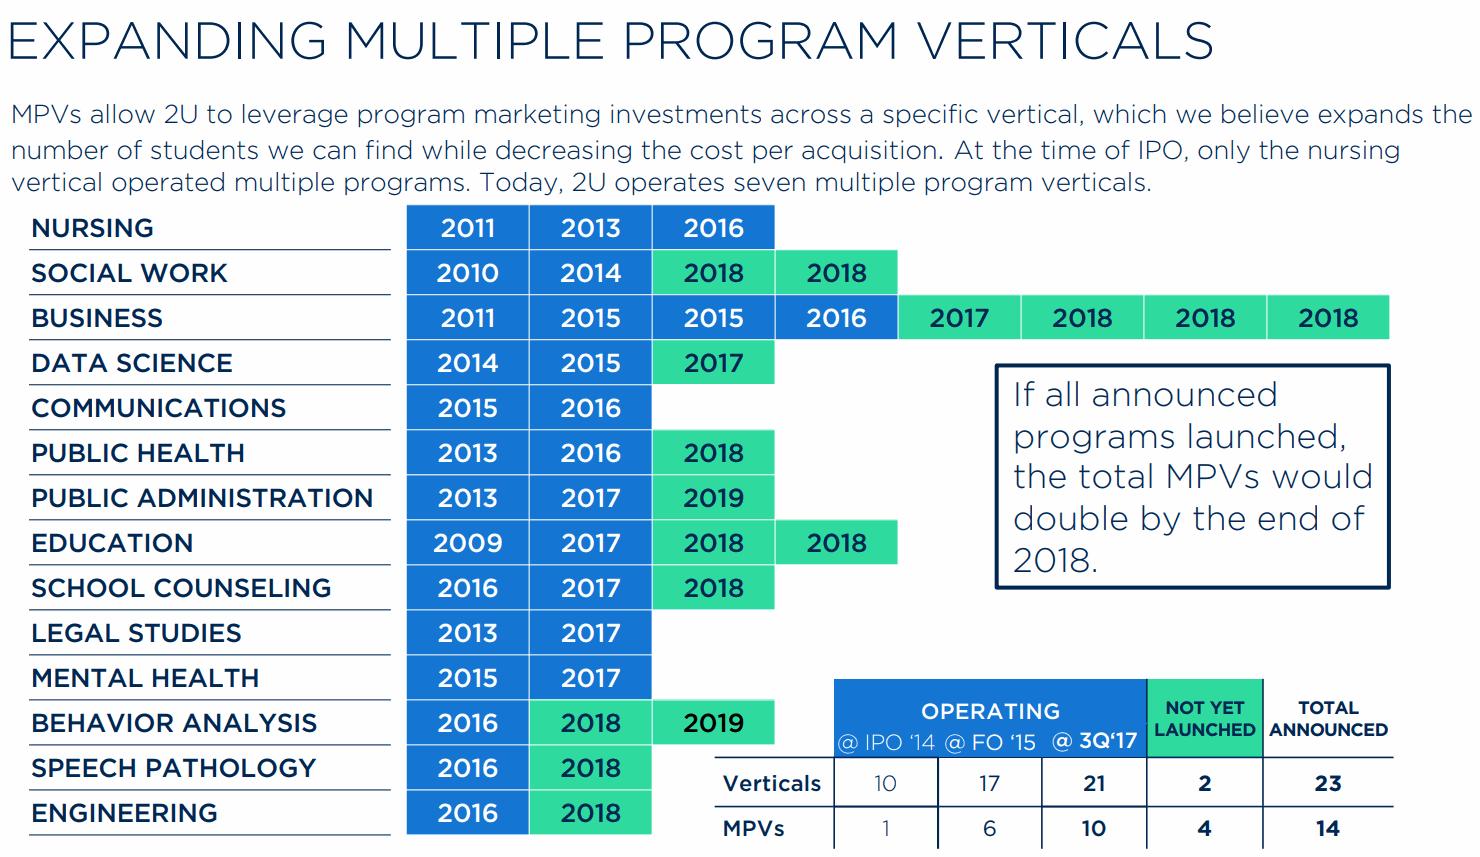 2U-GRAD-SEGMENT-EXPANDING-PROGRAMS